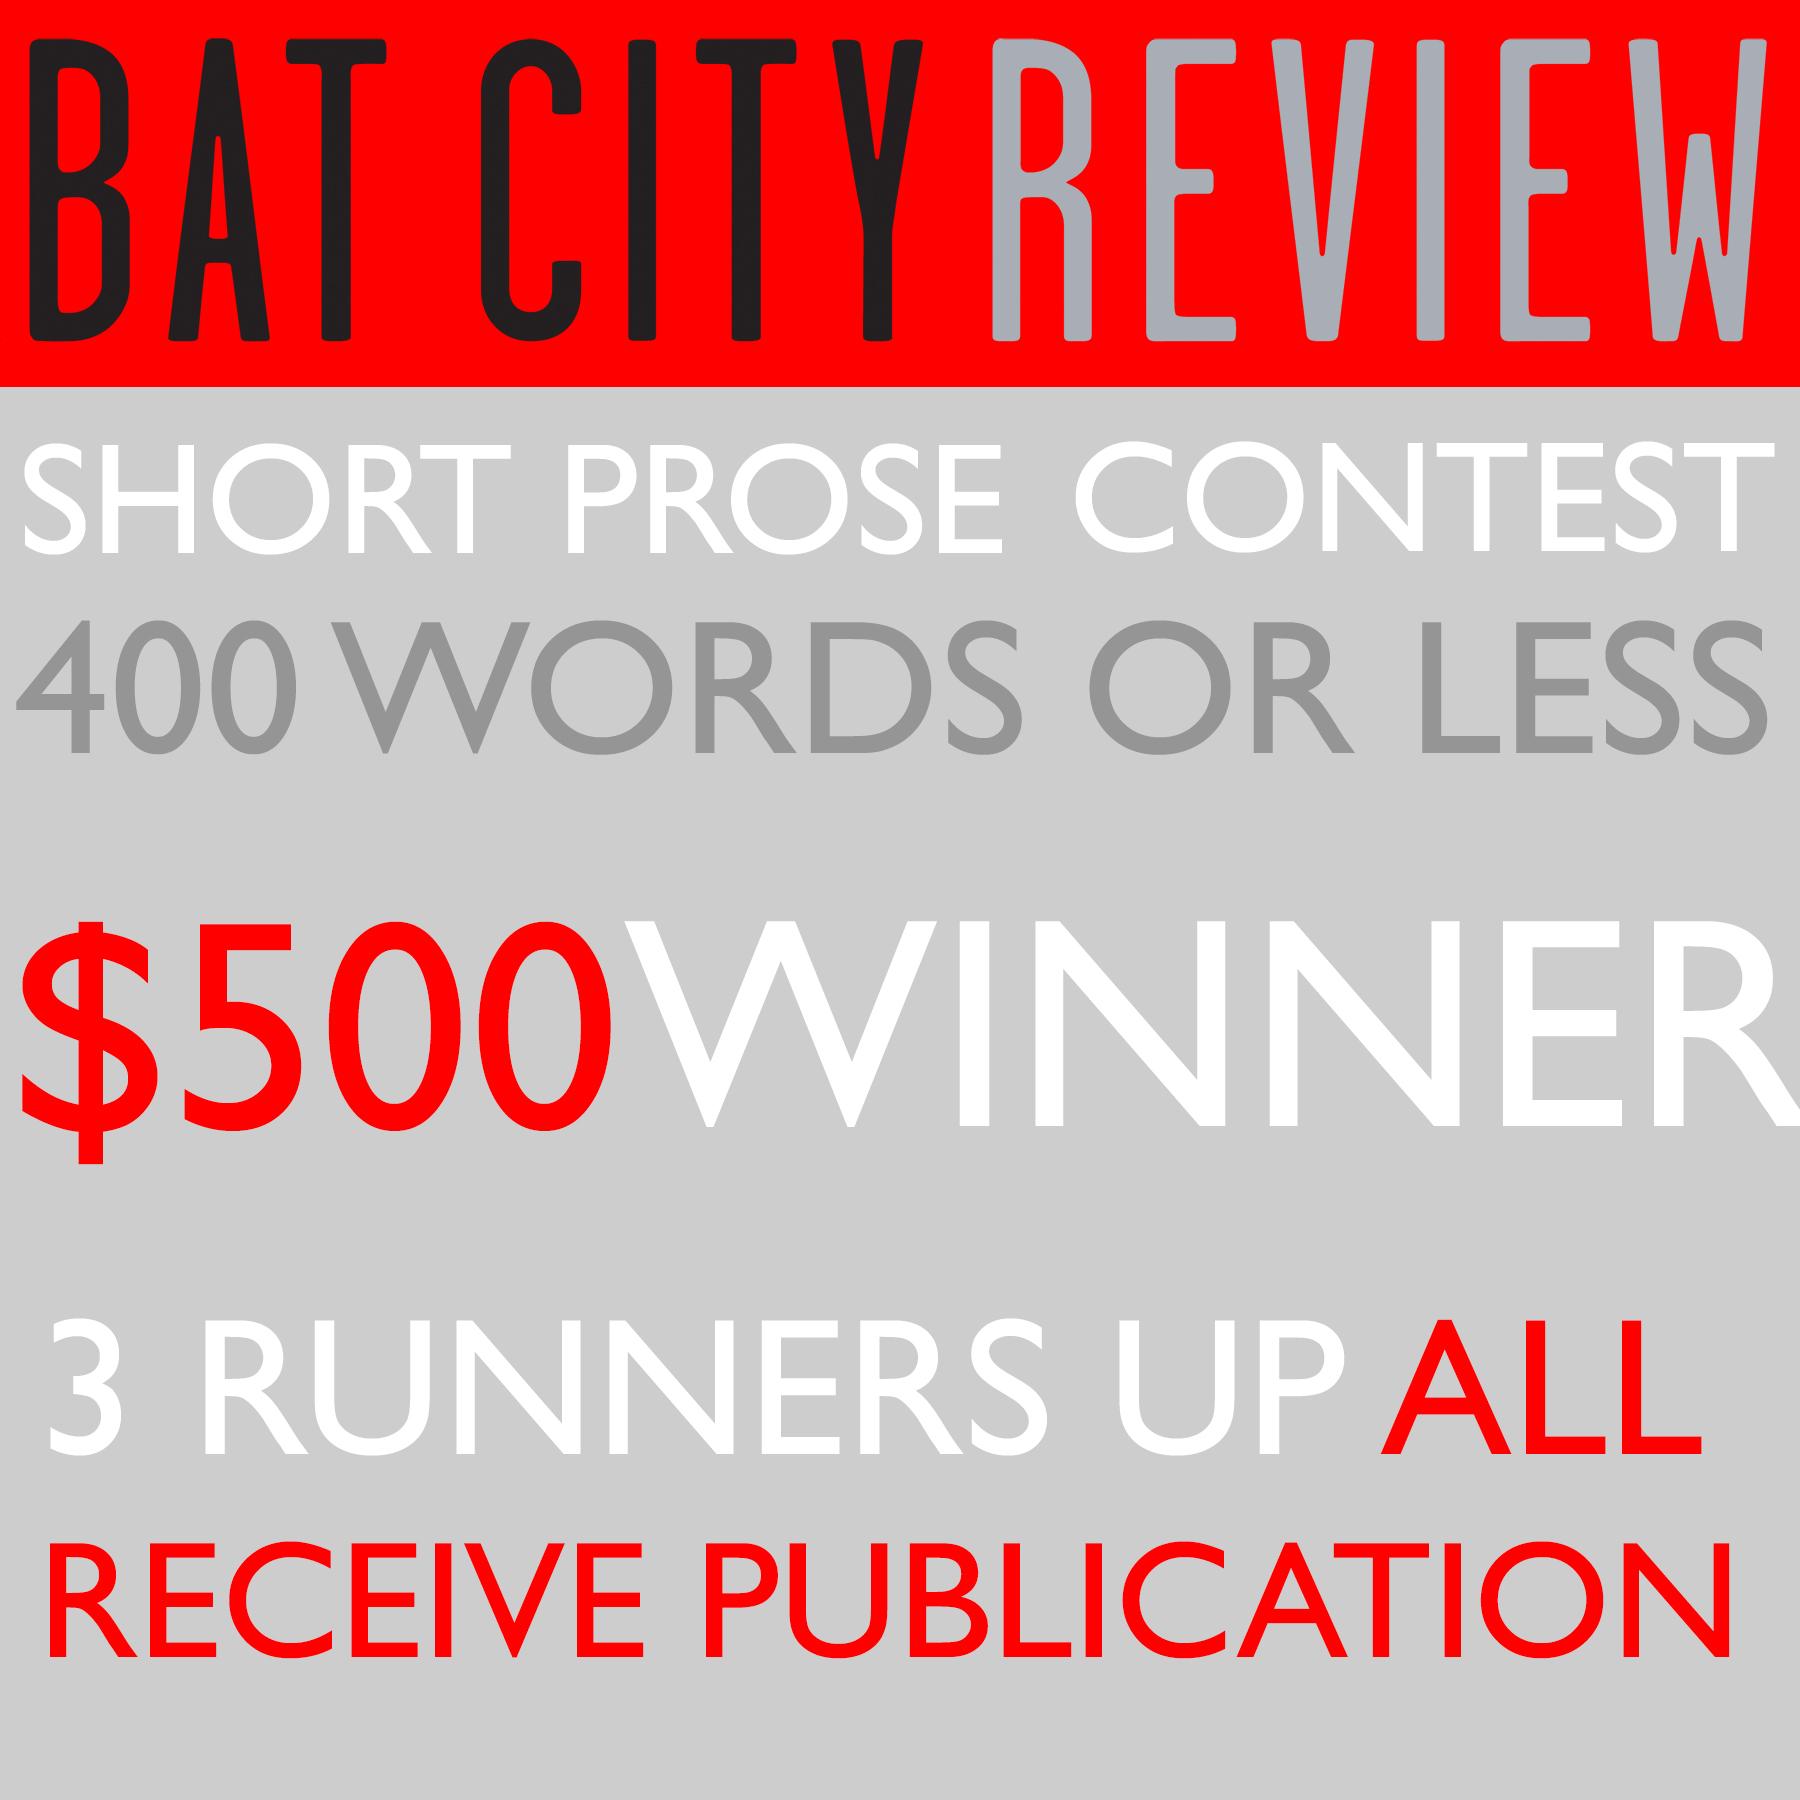 BCR short prose contest.jpg